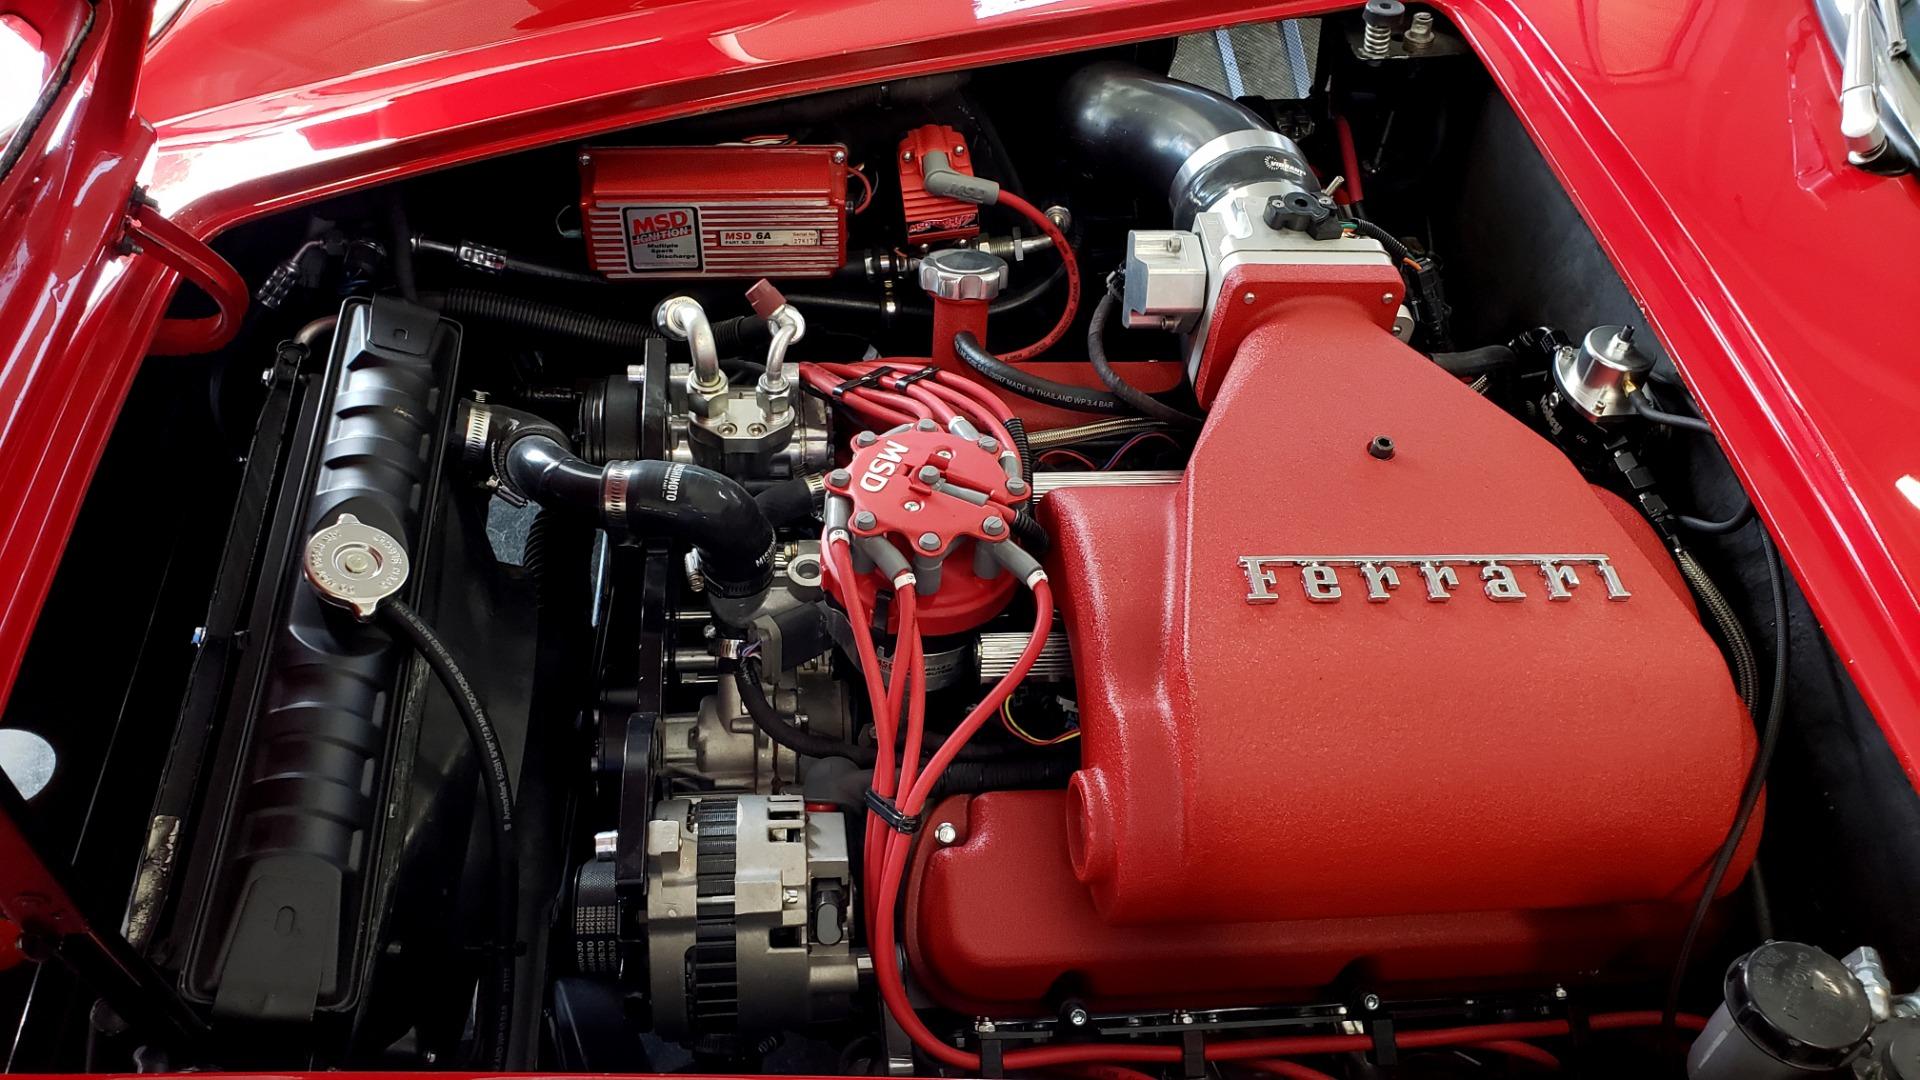 Used 1961 Ferrari 250GT SWB CALIFORNIA REPLICA / 302CI V8 / TREMEC 5-SPEED for sale Sold at Formula Imports in Charlotte NC 28227 64